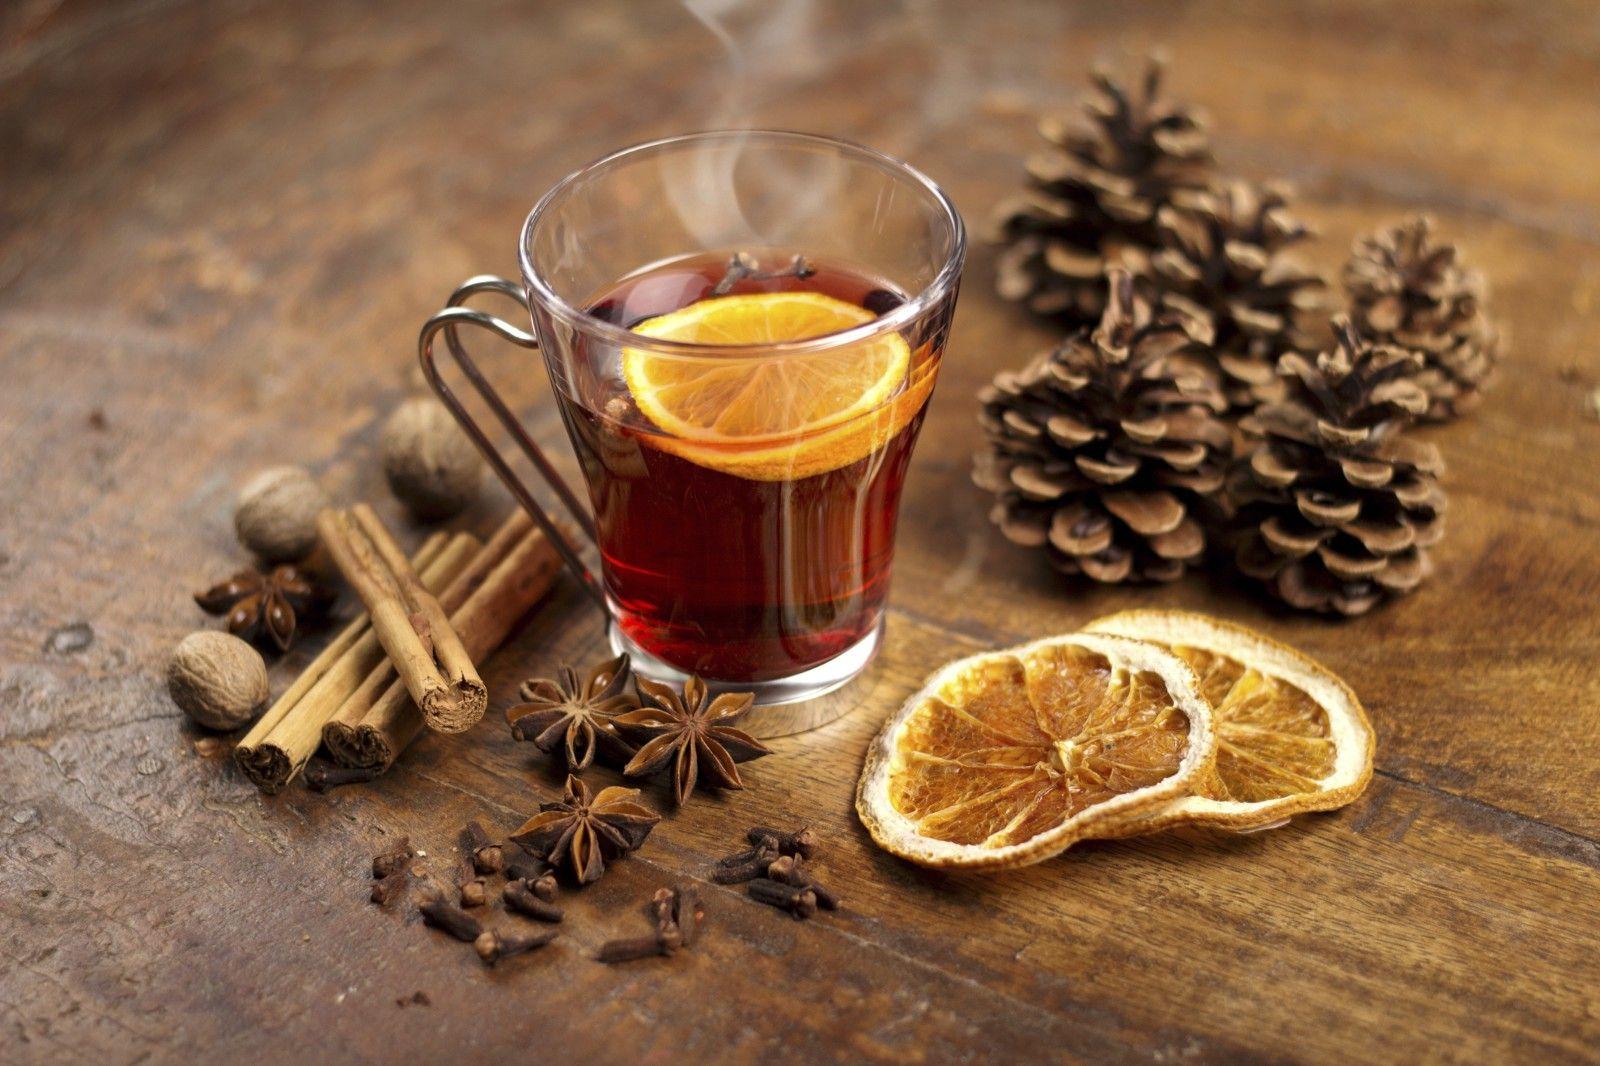 Diy Better Than Nyquil Meds Orange Clove Orange Recipes Natural Fragrance Oil